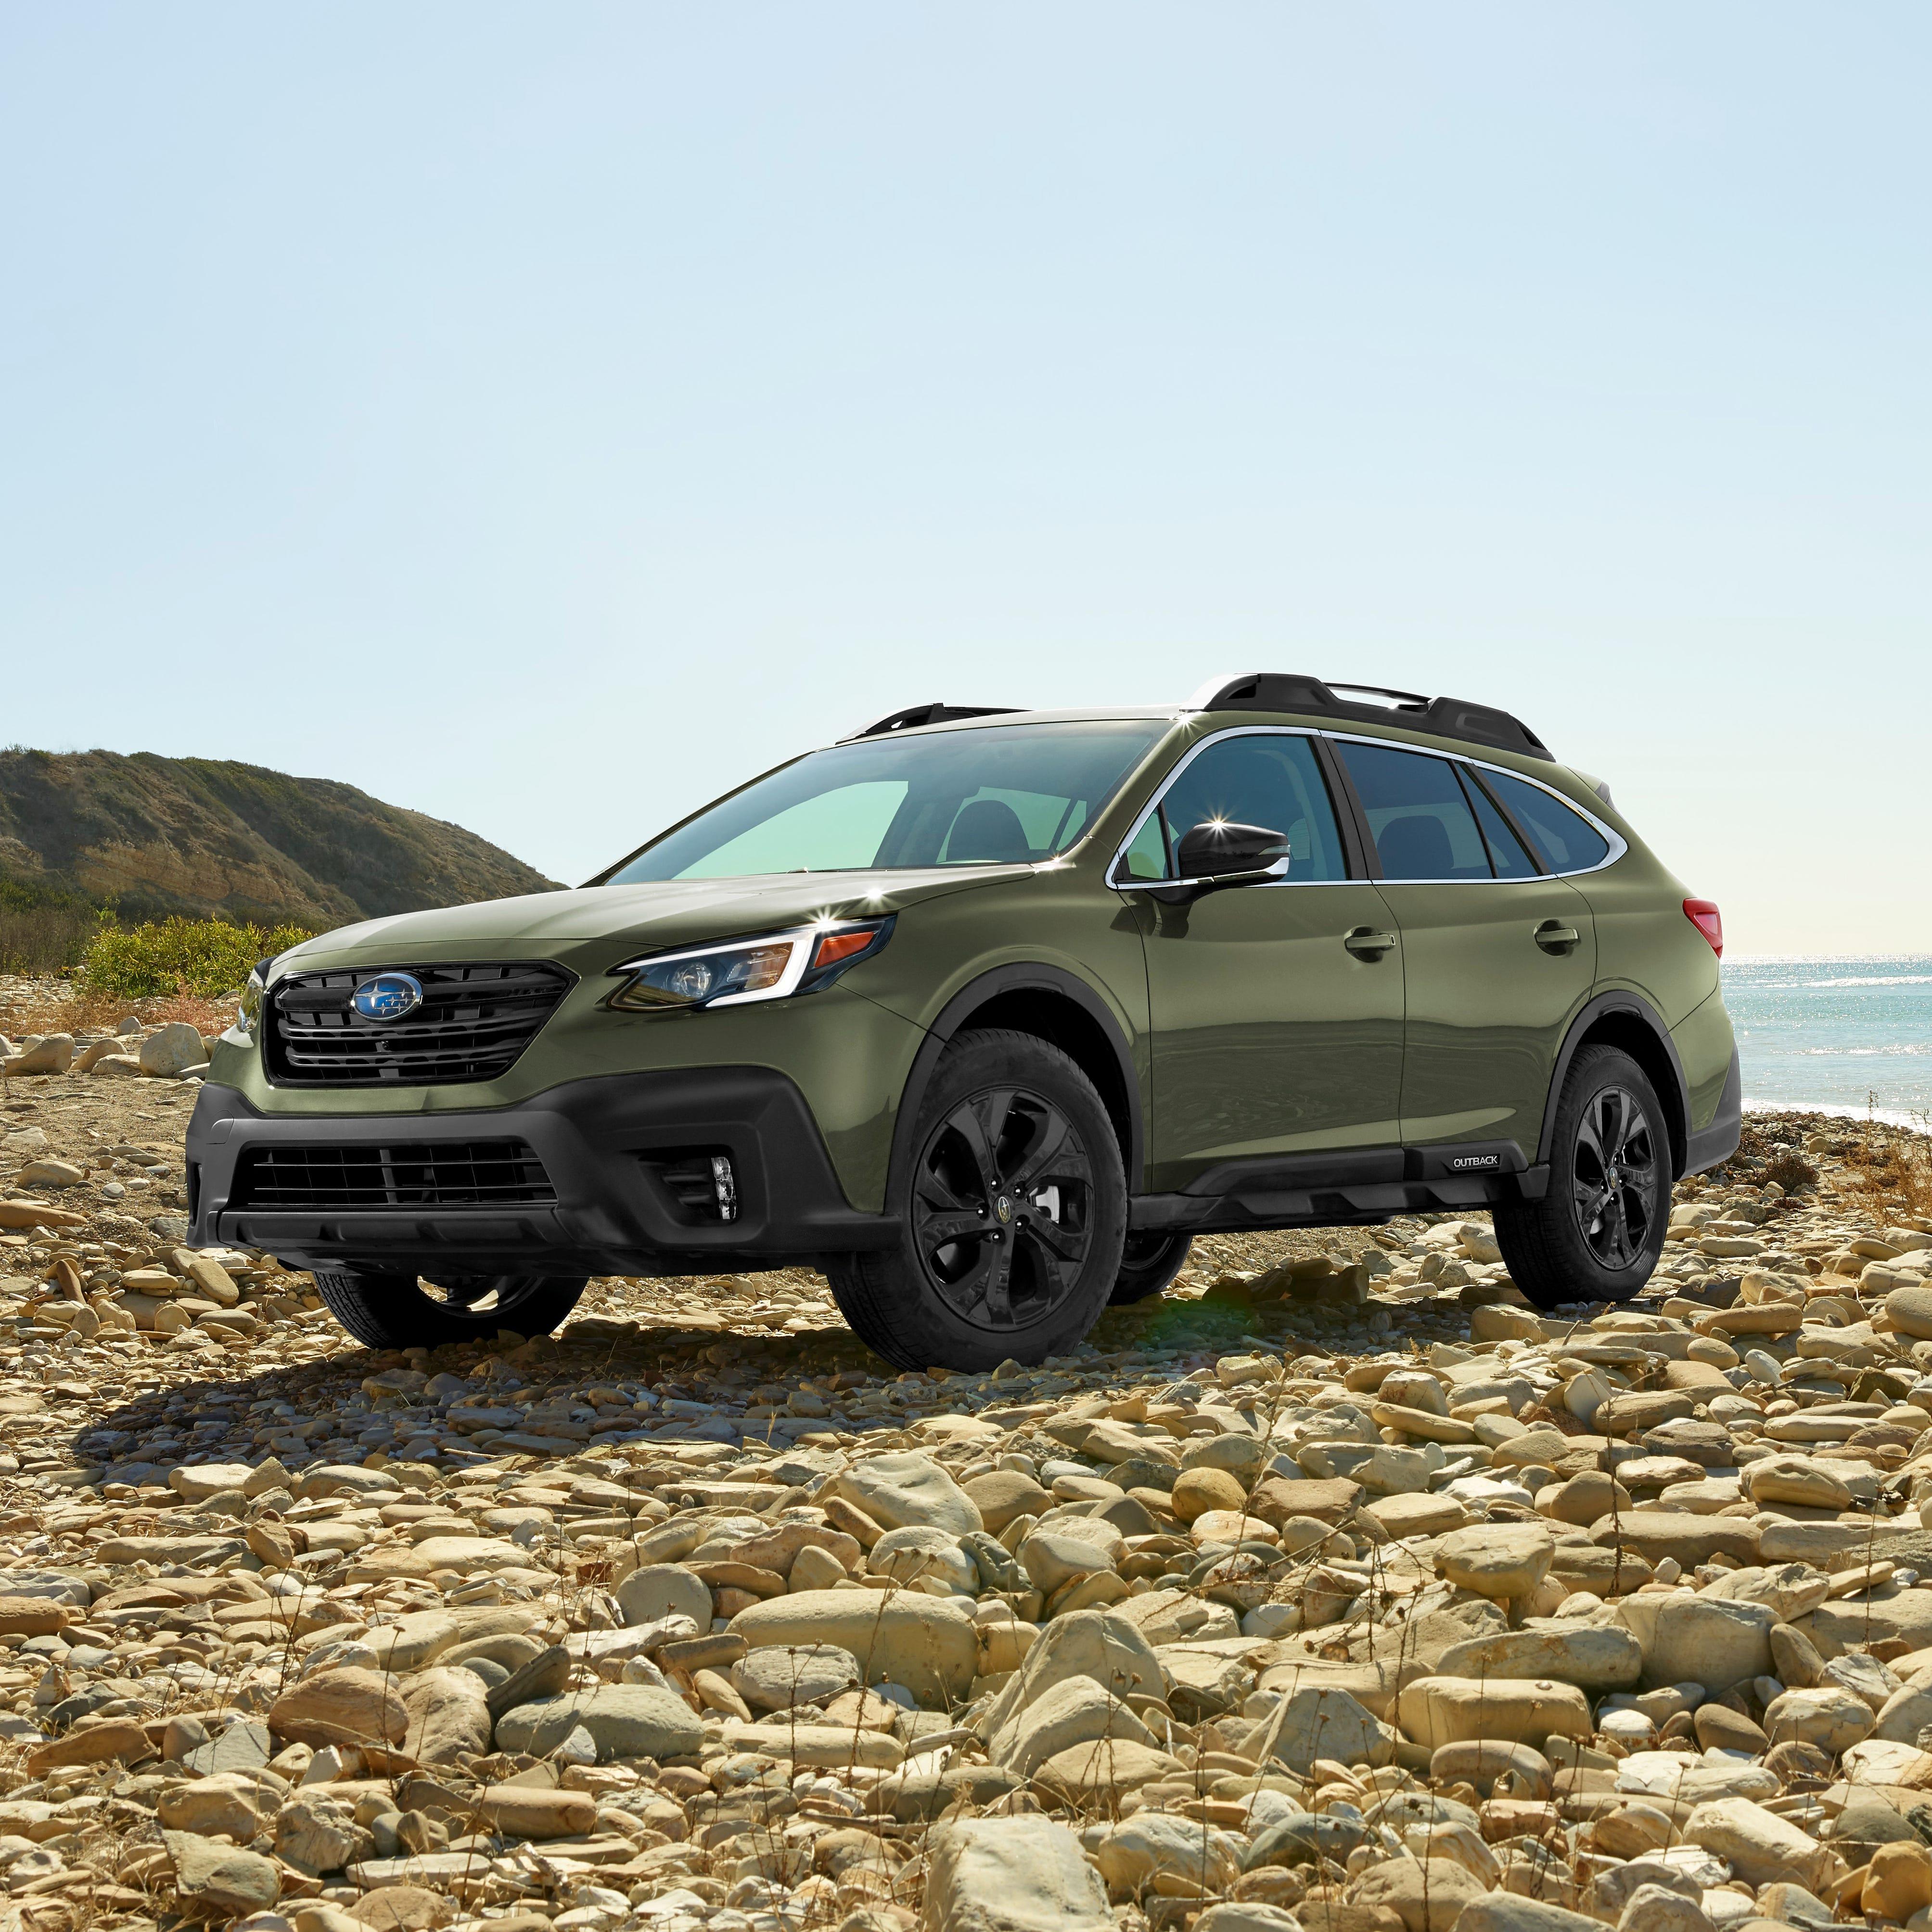 Subaru premieres next-generation 2020 Outback